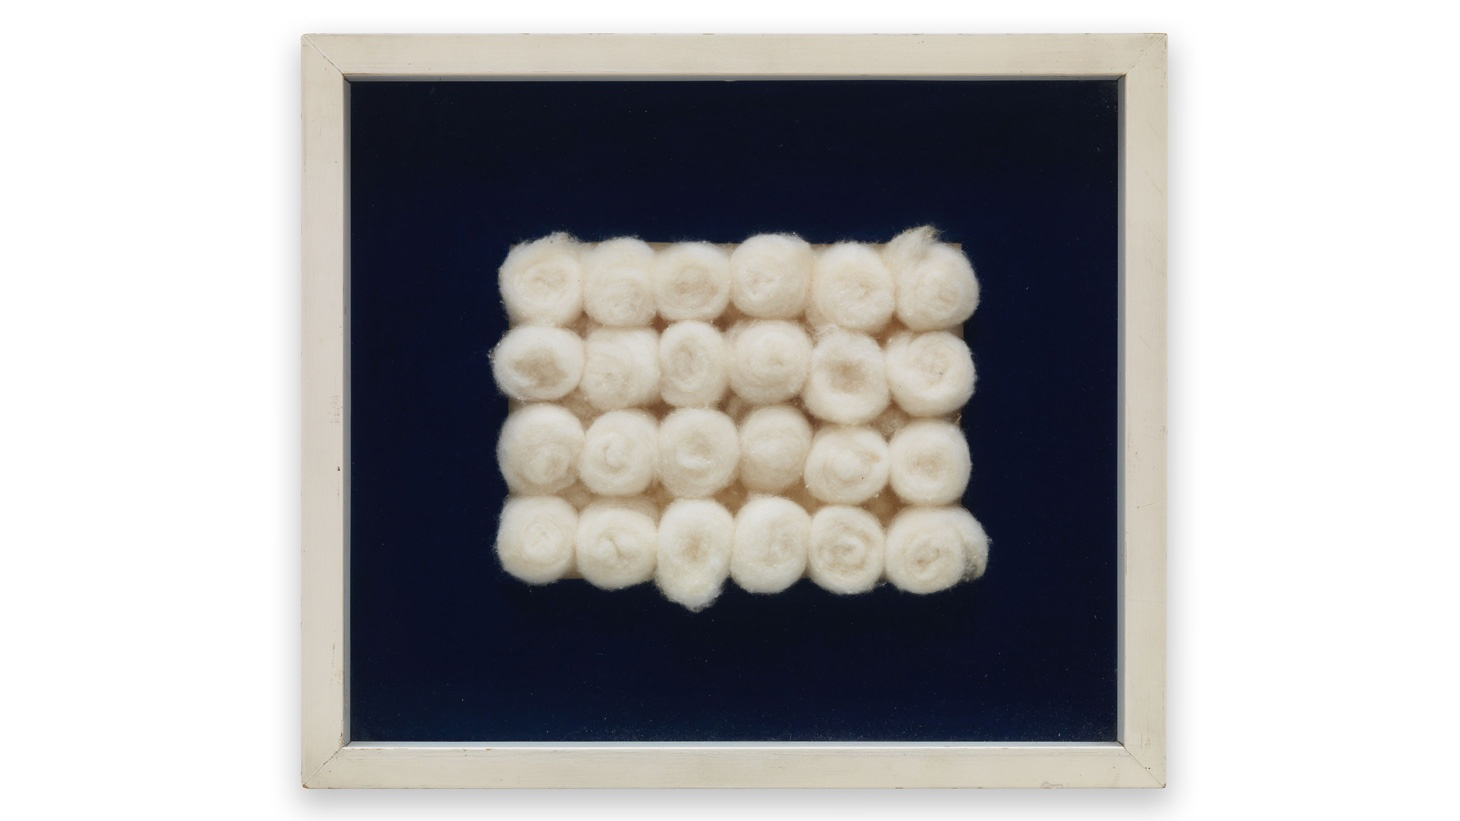 Piero Manzoni. Achrome. 1961 - 1962. Cotton wool balls 15 x 20 cm / 5 7/8 x 7 7/8 in (cotton). Private Collection